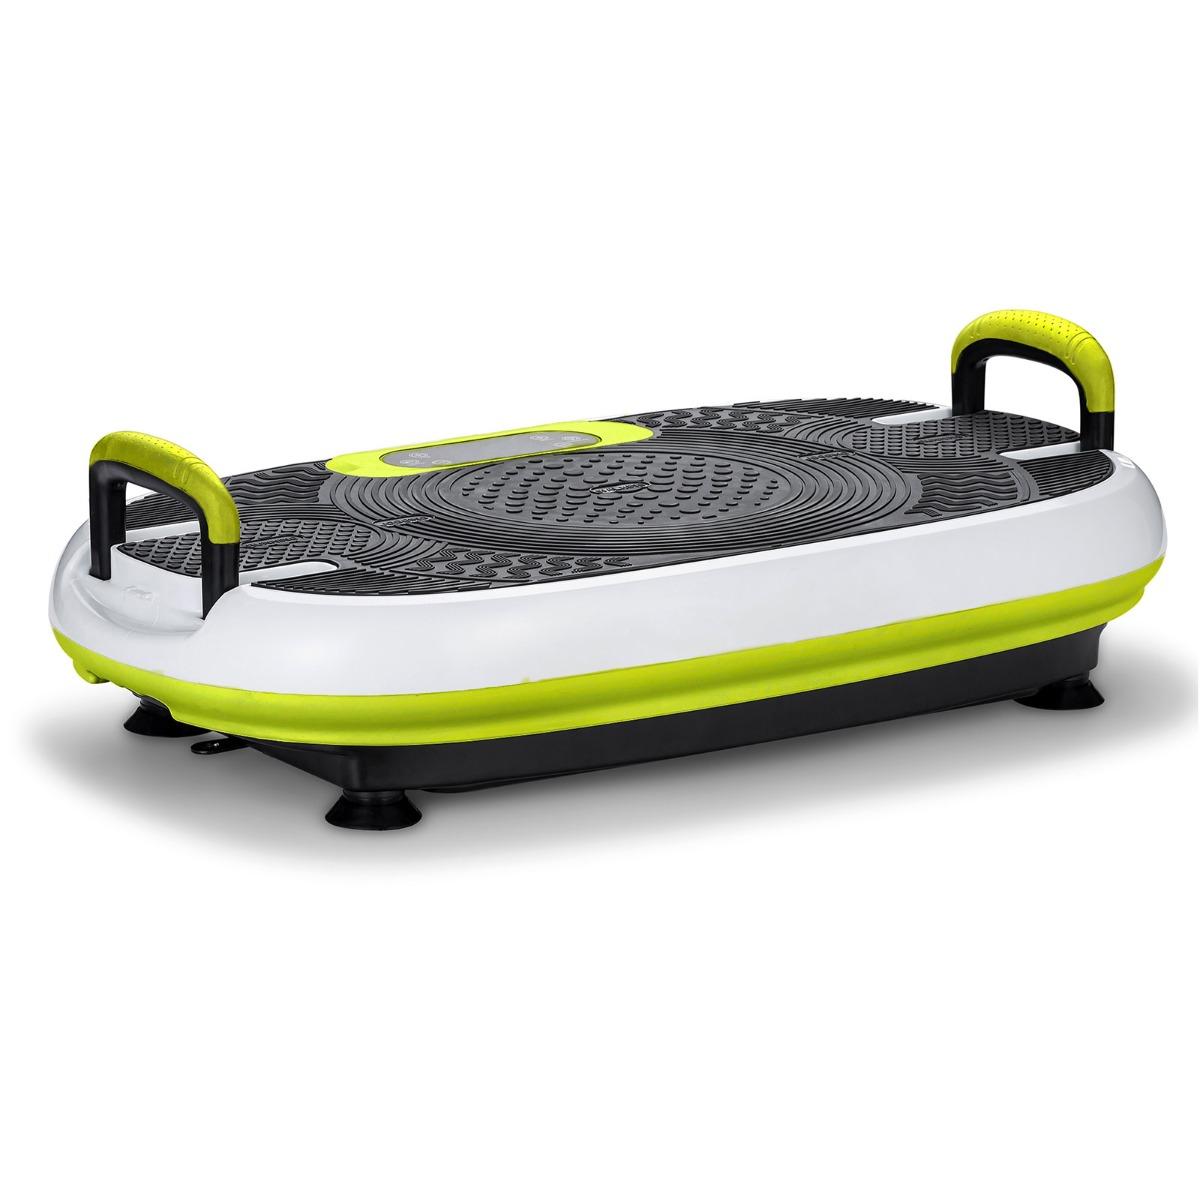 Refurbished VibroSlim Radial Plus 3D Fitness Vibration Plate - Green & White